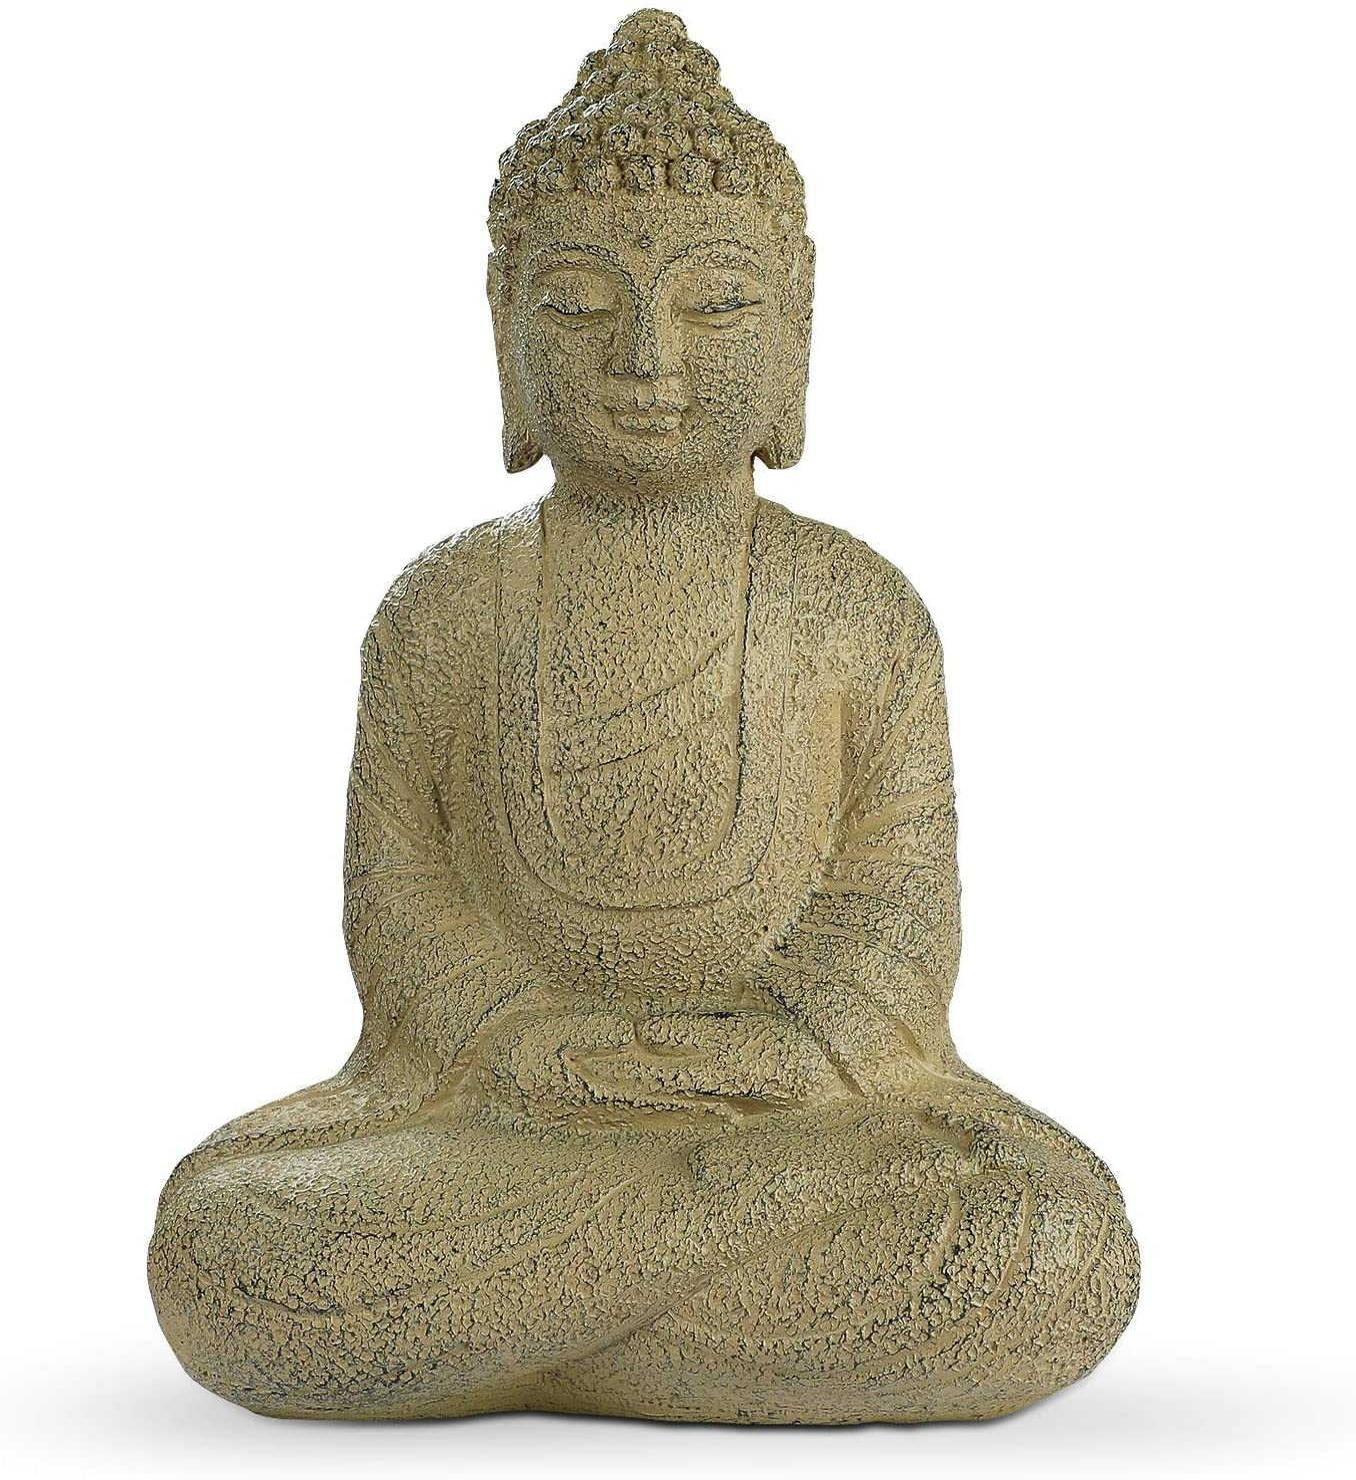 Meditating Buddha Statue, Zen Buddha Figurine in Earth Yellow Finish, Buddha Sculpture for Home & Garden Decorations (14